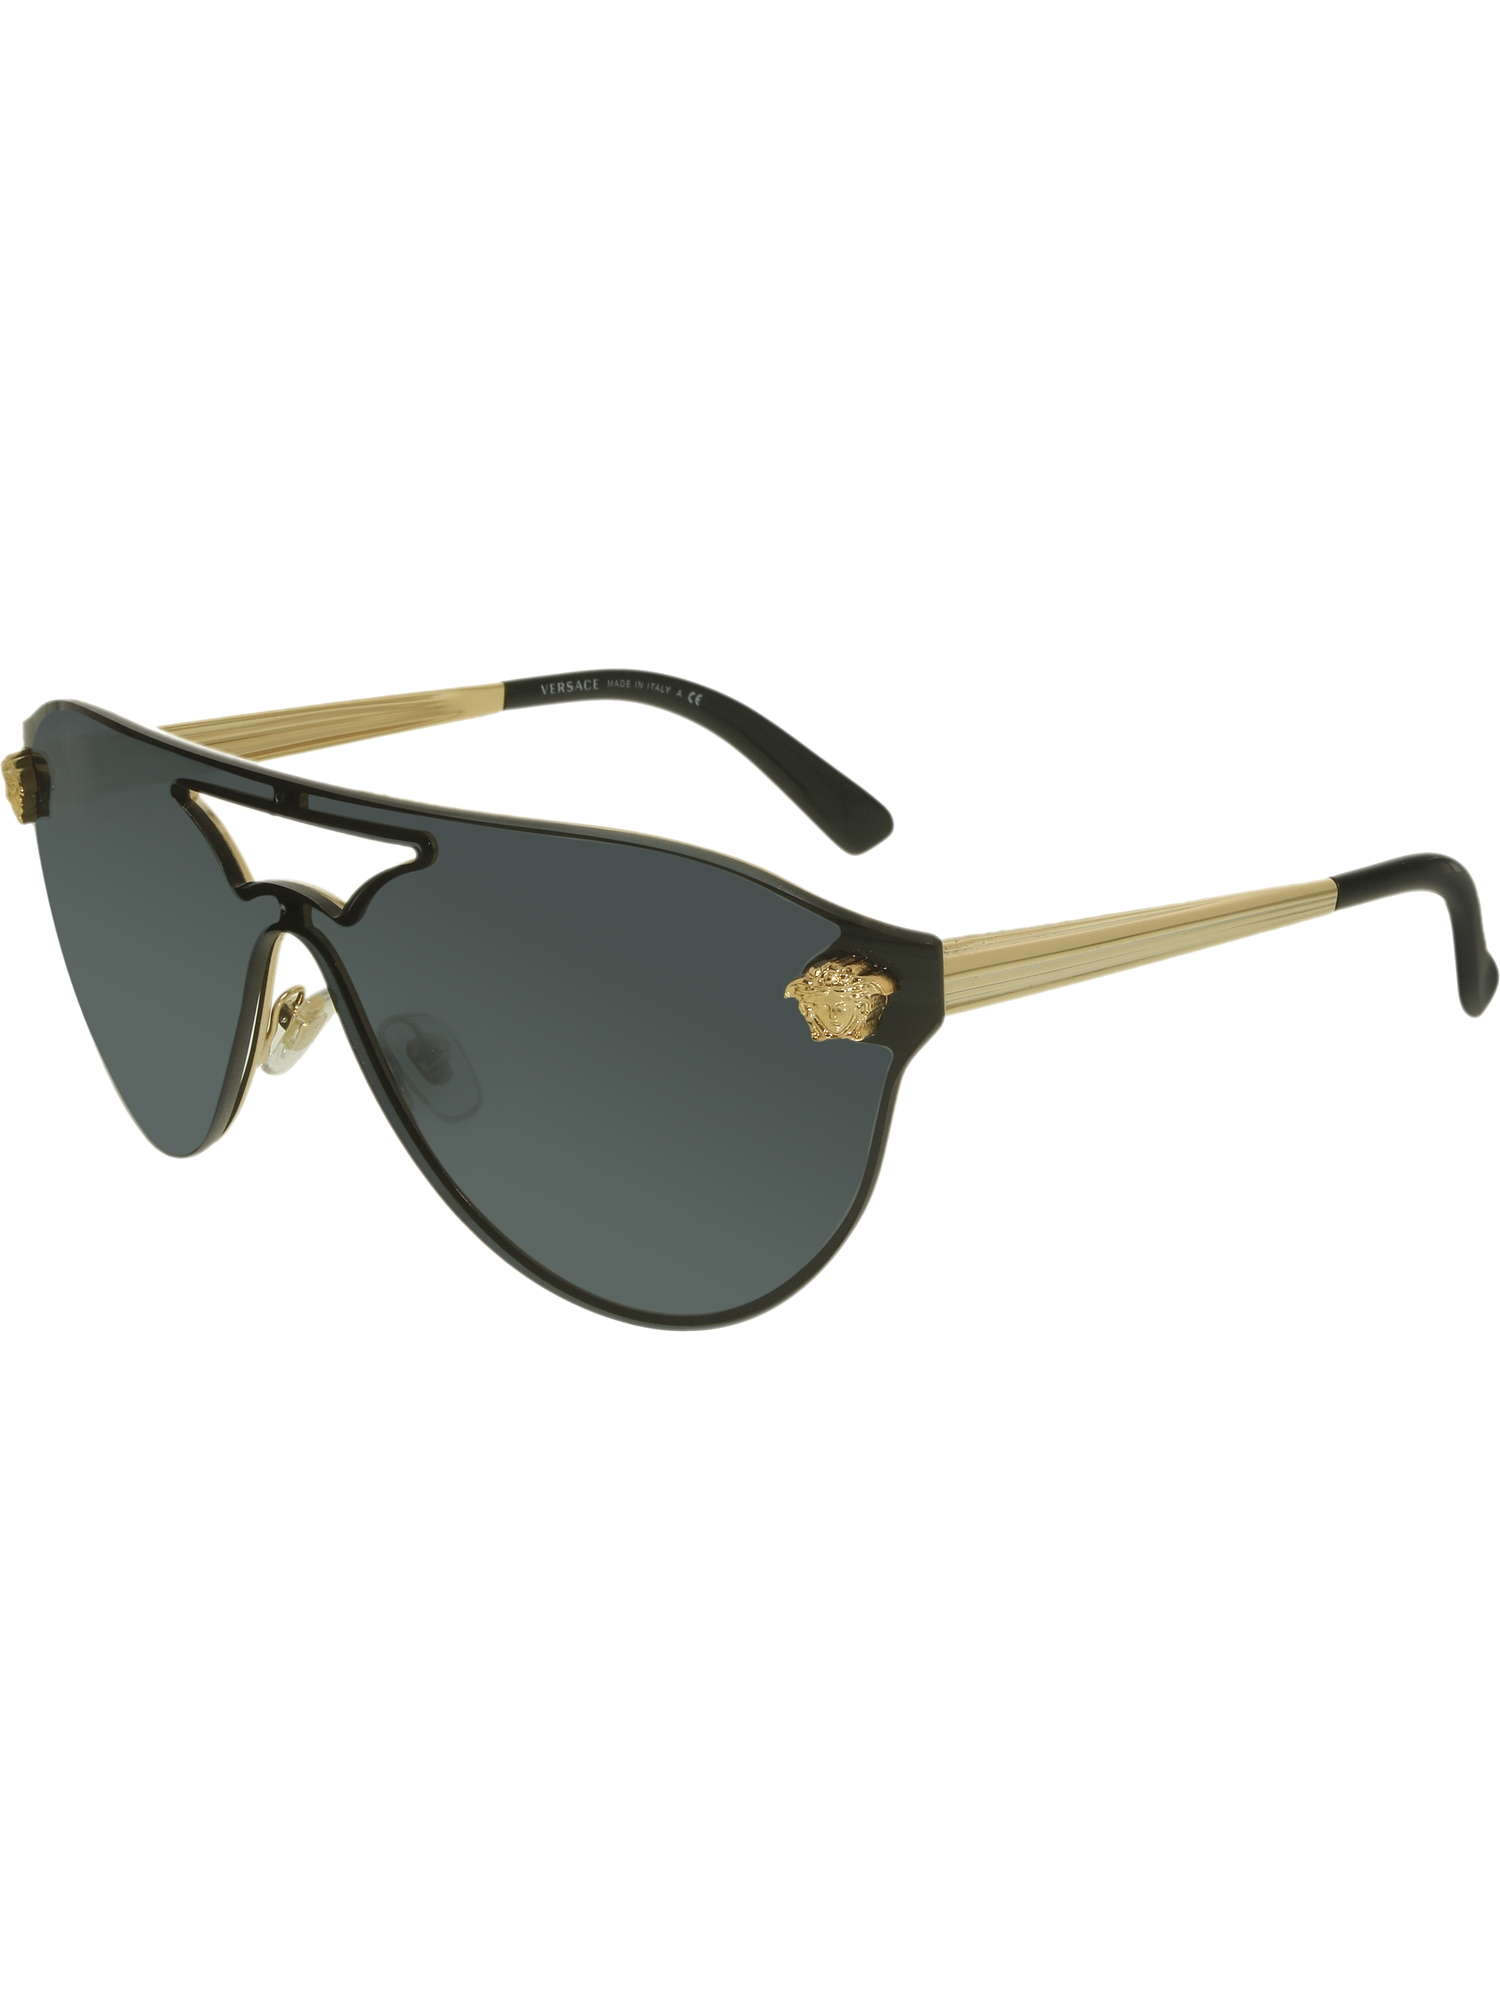 9abc7a52ec Versace - Women s VE2161-100287-42 Black Shield Sunglasses - Walmart.com